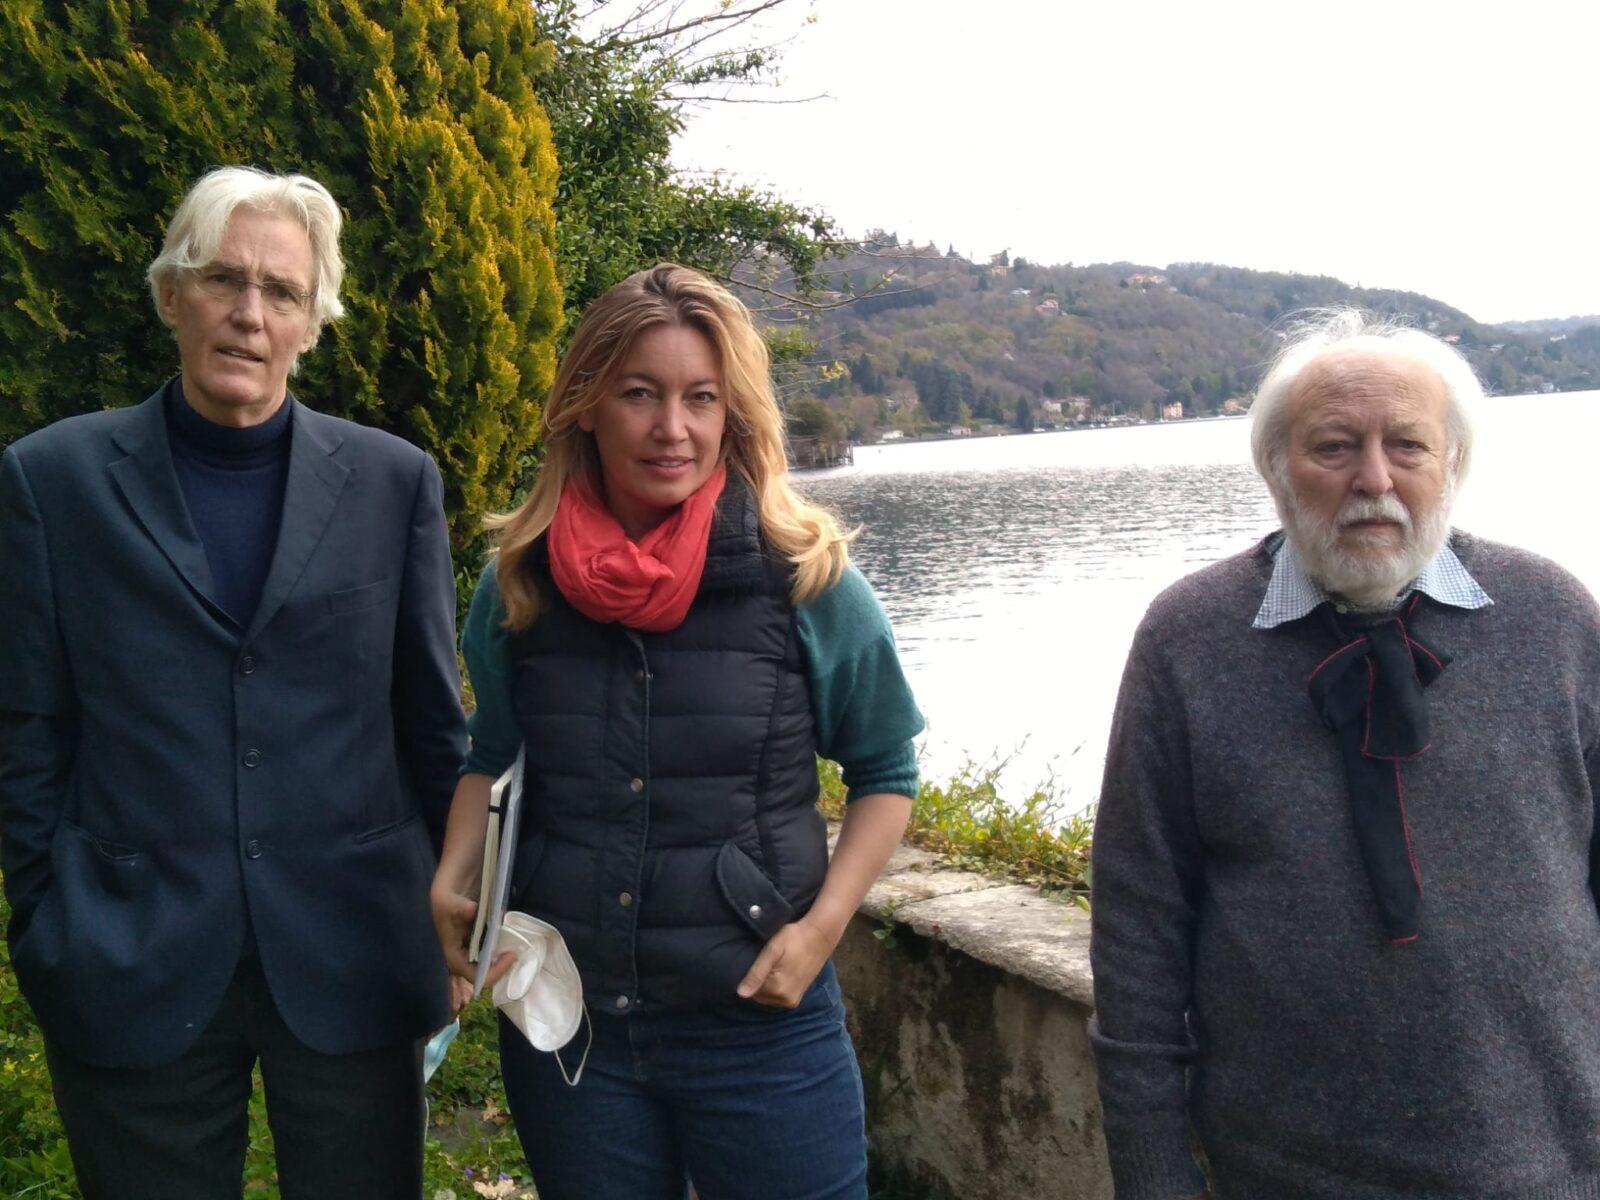 da sinistra: Paul Russel, Andrea Vogt e Cesare Berrmani